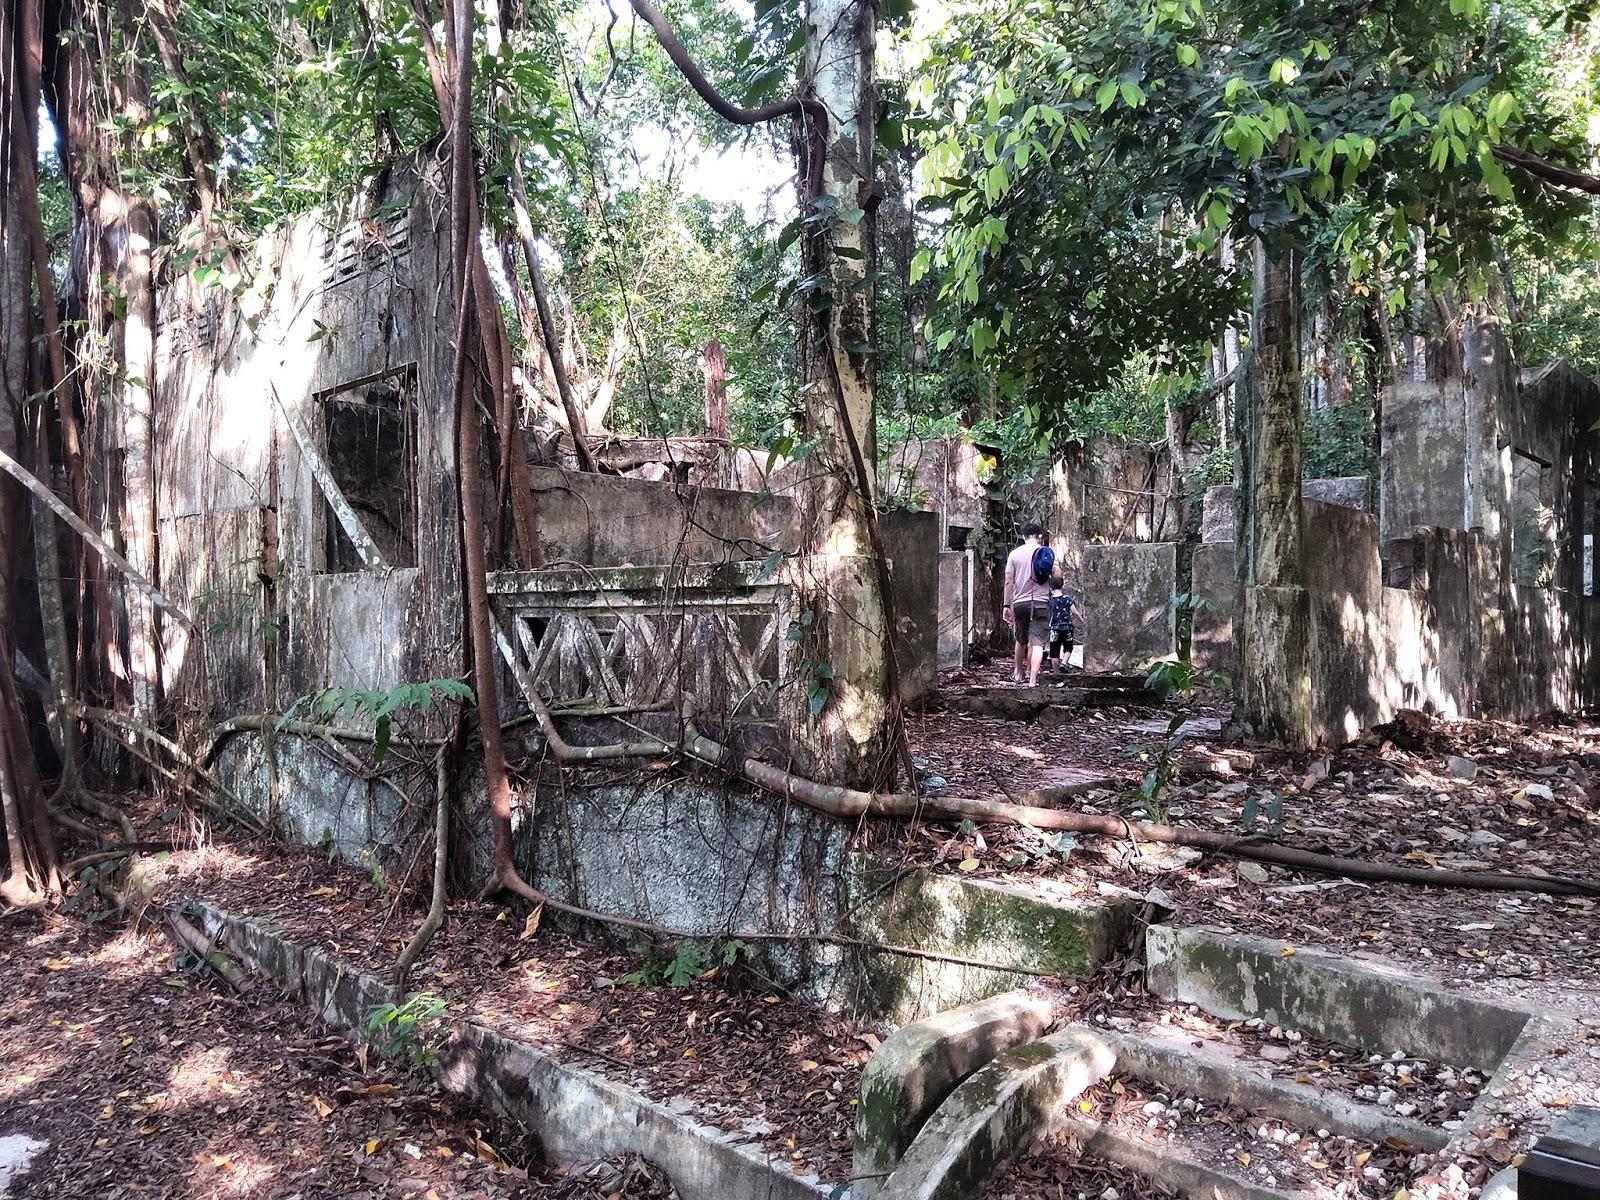 hainan village ruins, thomson nature park